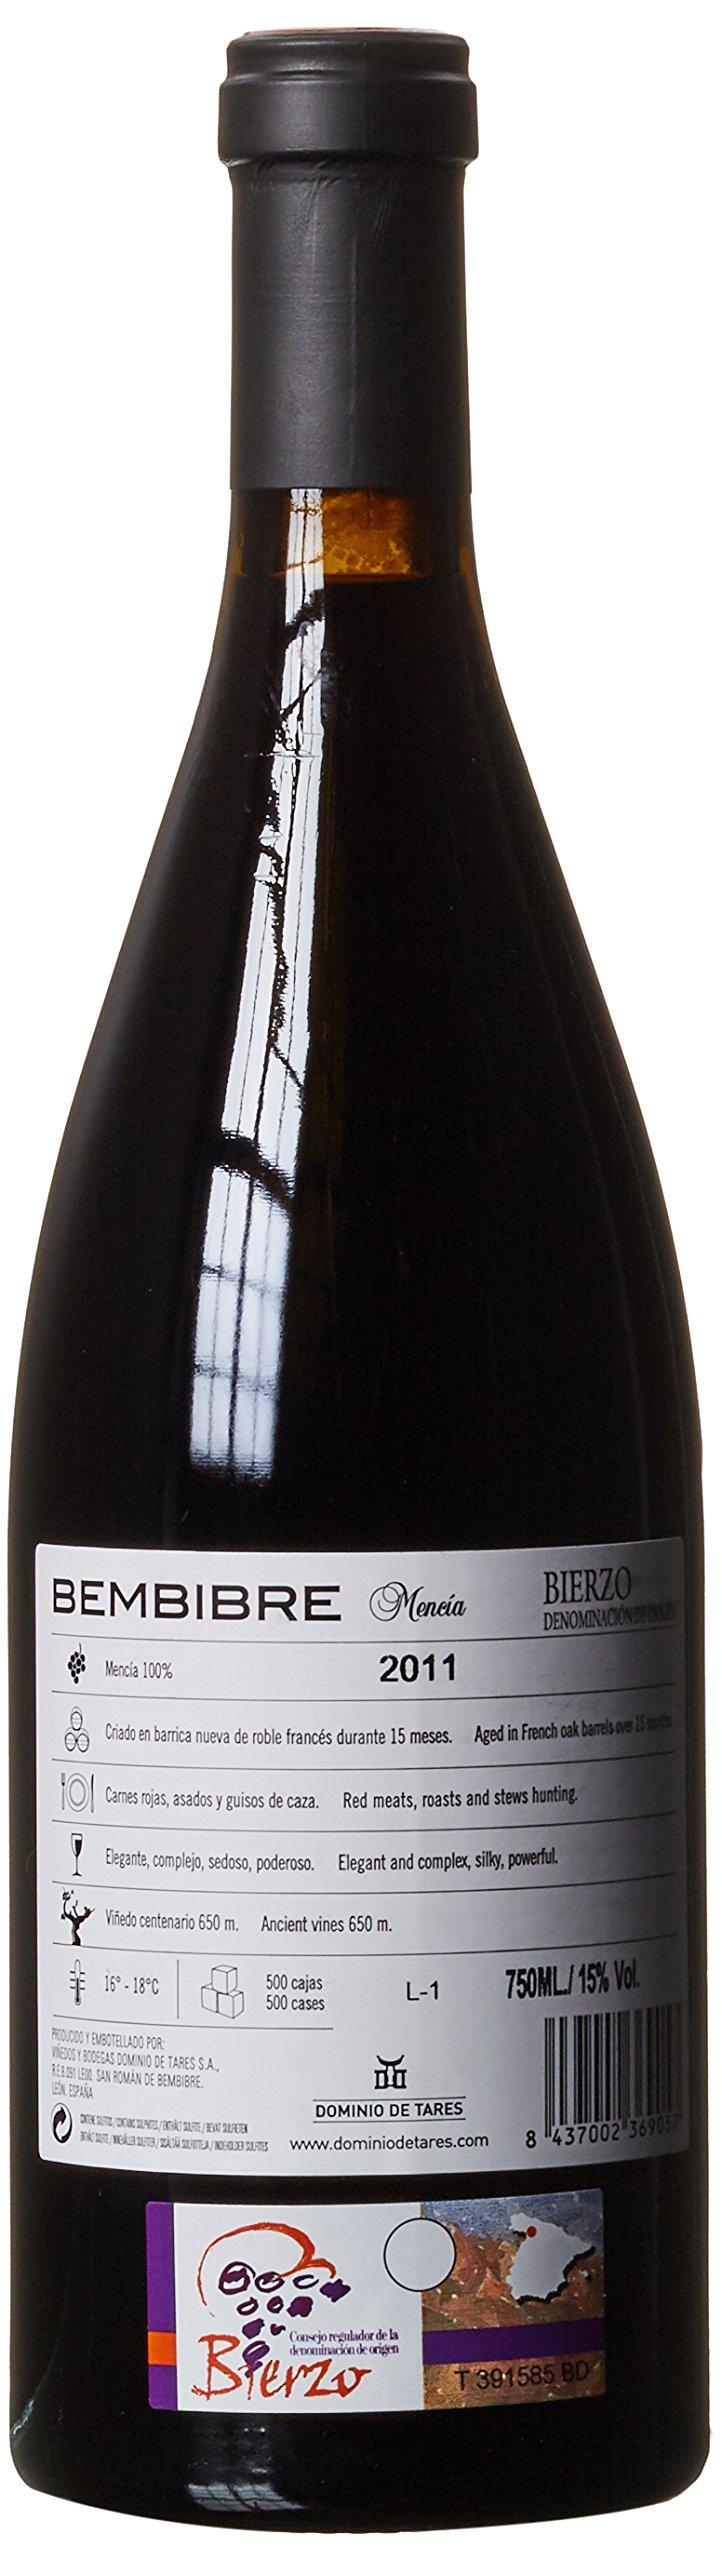 Dominio-de-Tares-Bembibre-Menca-2011-trocken-1-x-075-l